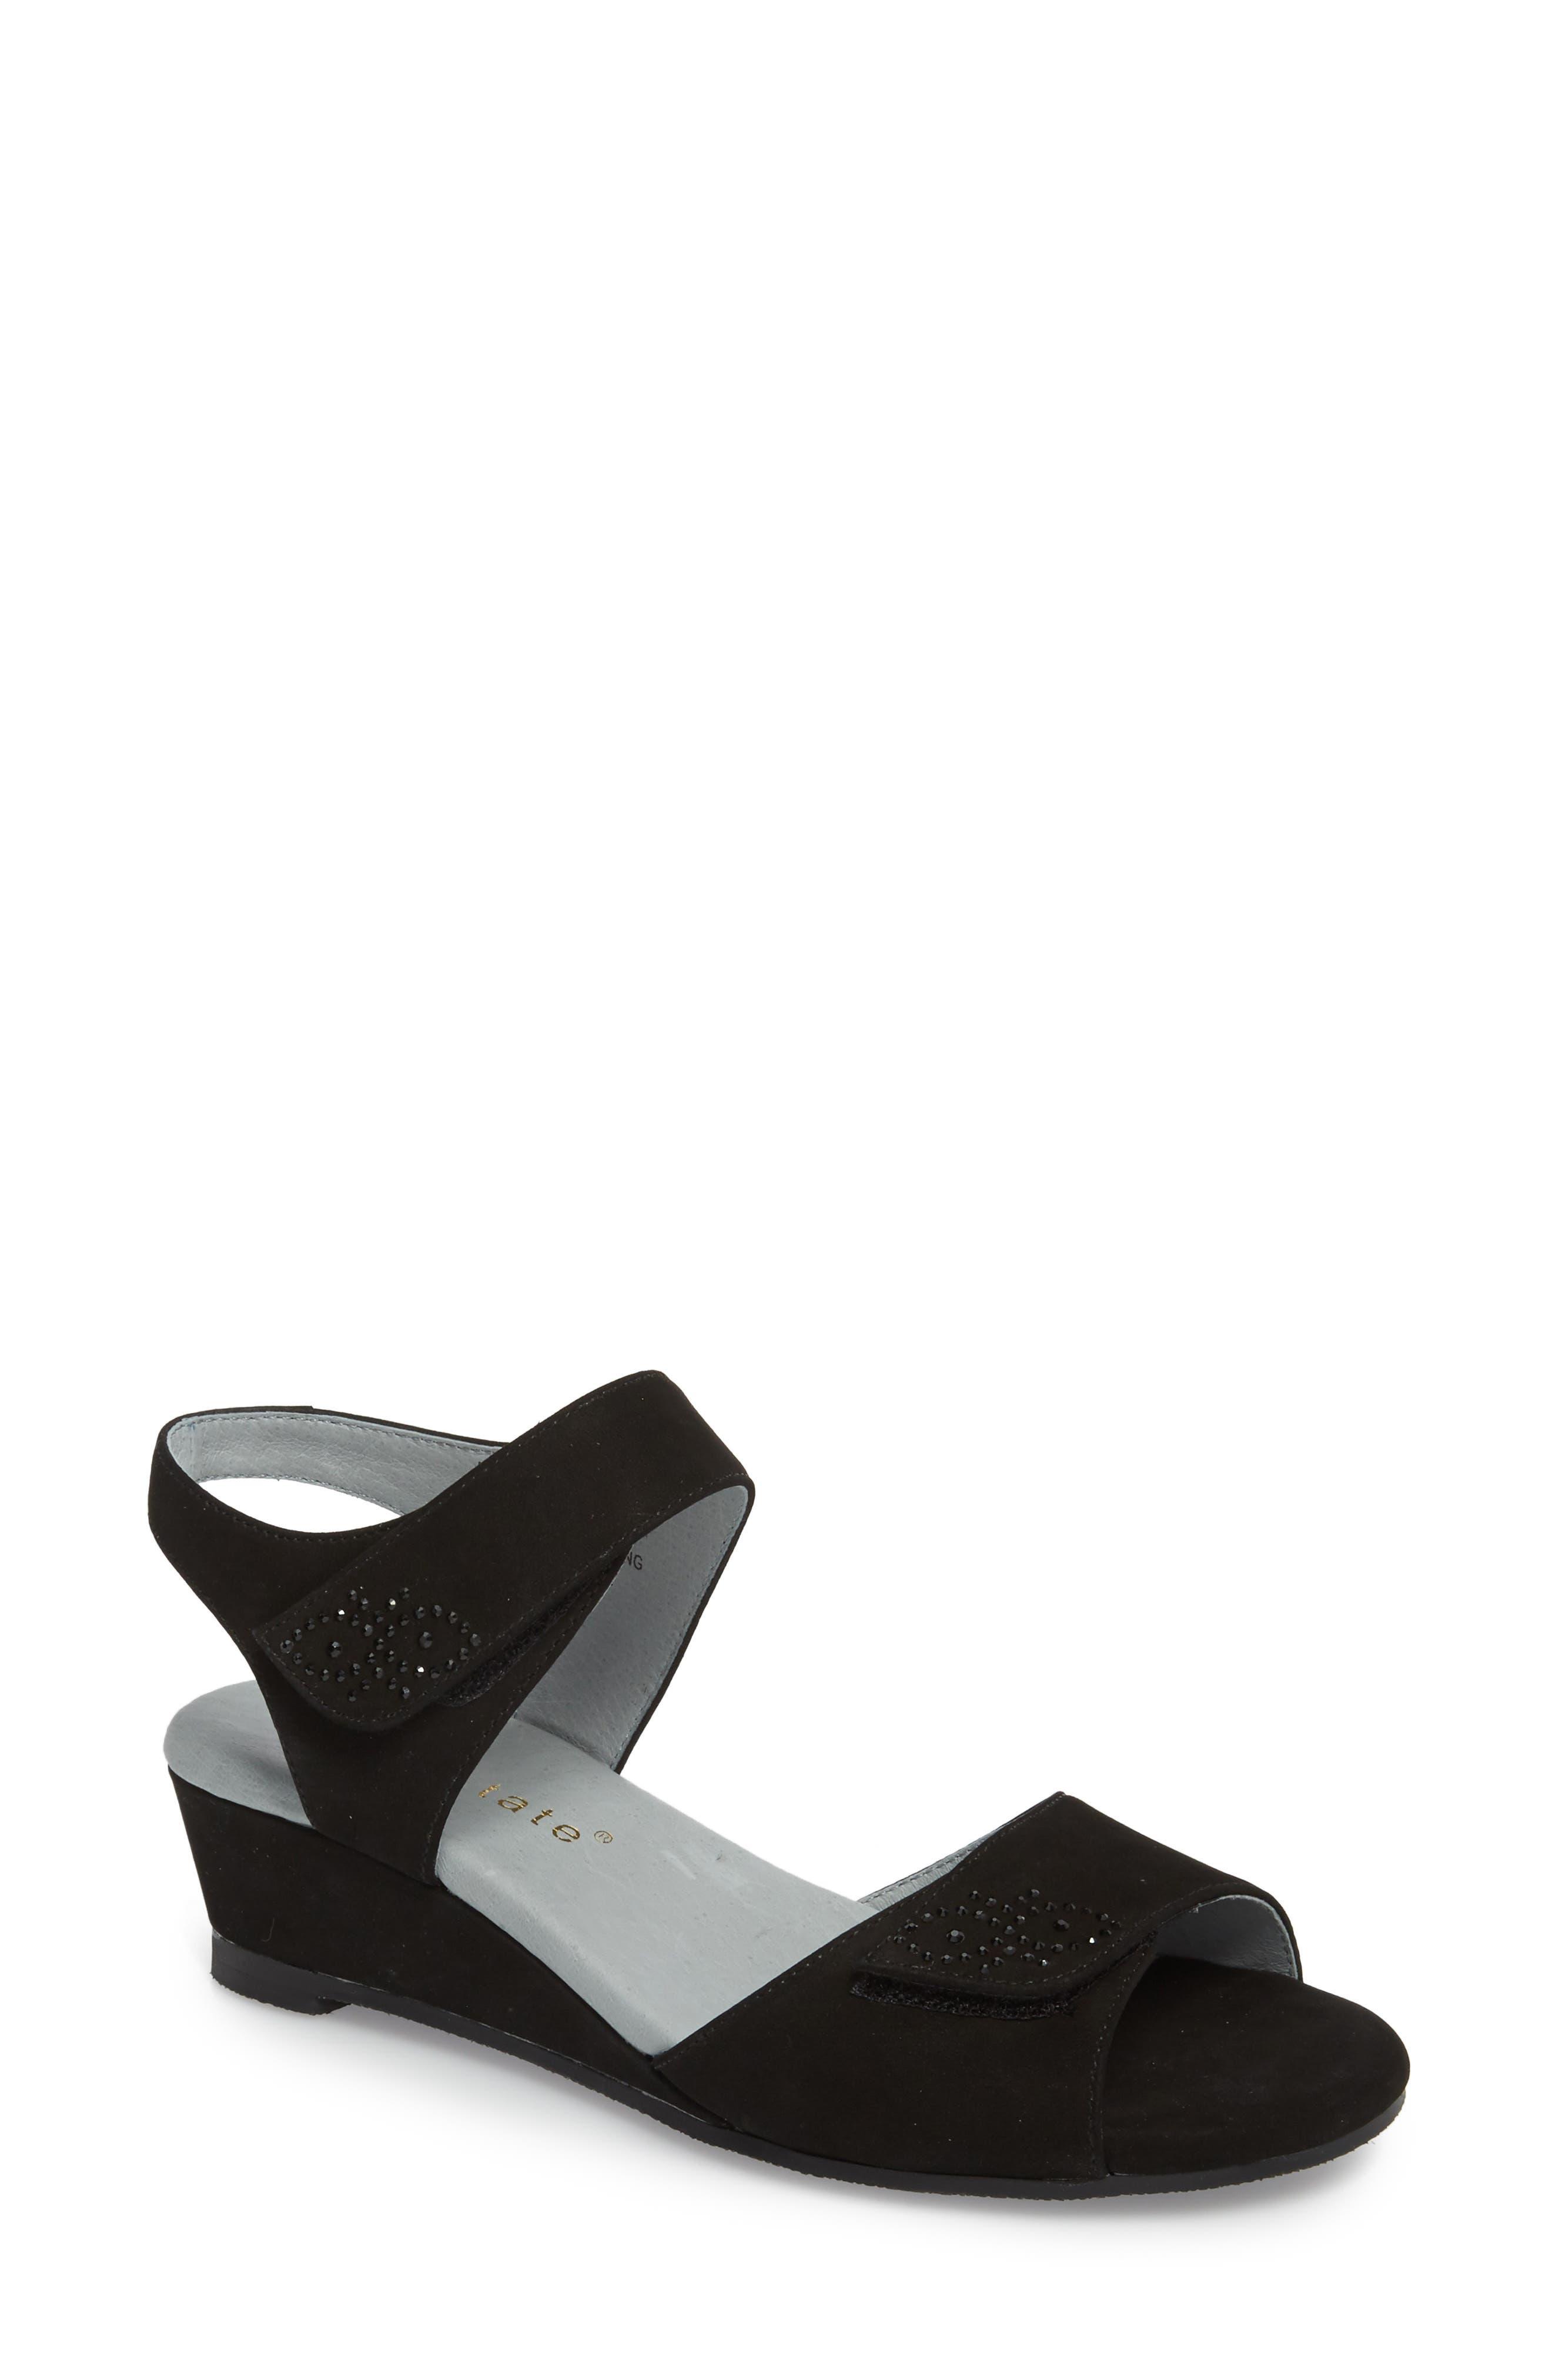 Queen Embellished Wedge Sandal,                             Main thumbnail 1, color,                             Black Nubuck